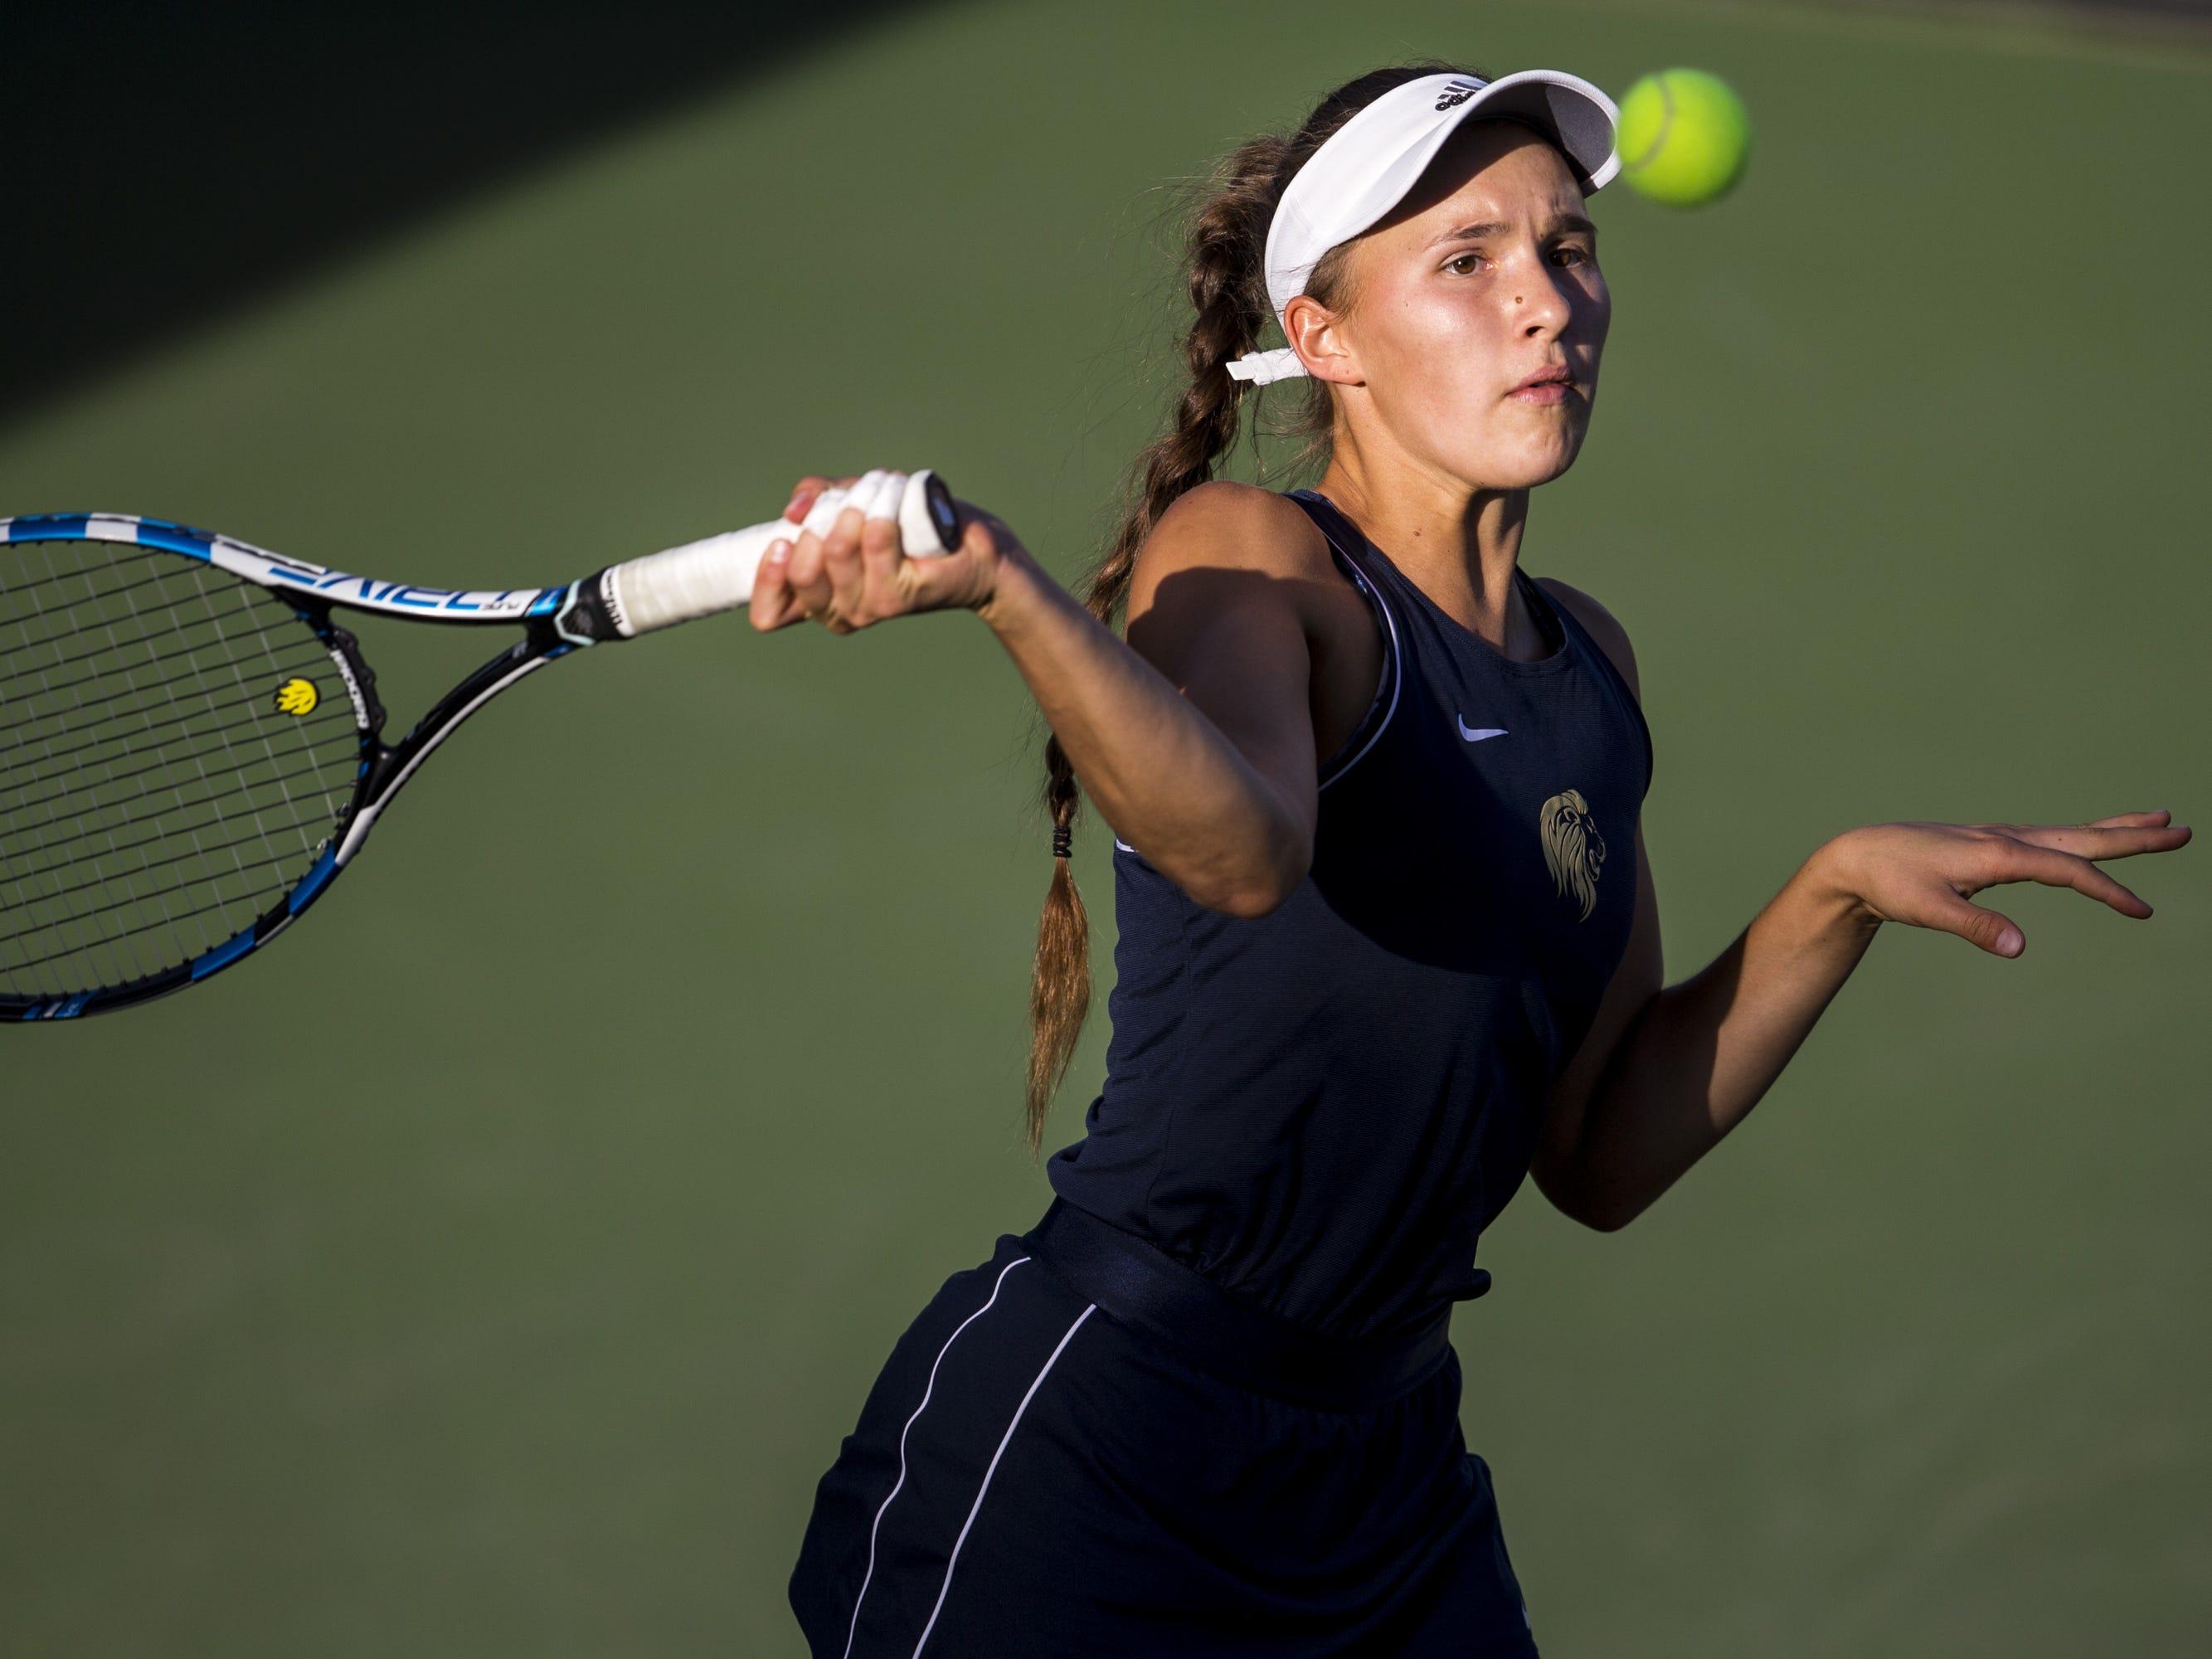 Pusch Ridge's Sofia Fetsis returns the ball against Chandler Prep's Sangeet Bhalla during the Division III Girls Tennis Singles State Championship on Monday, April 29, 2019, at Whiteman Tennis Center in Tempe, Ariz.